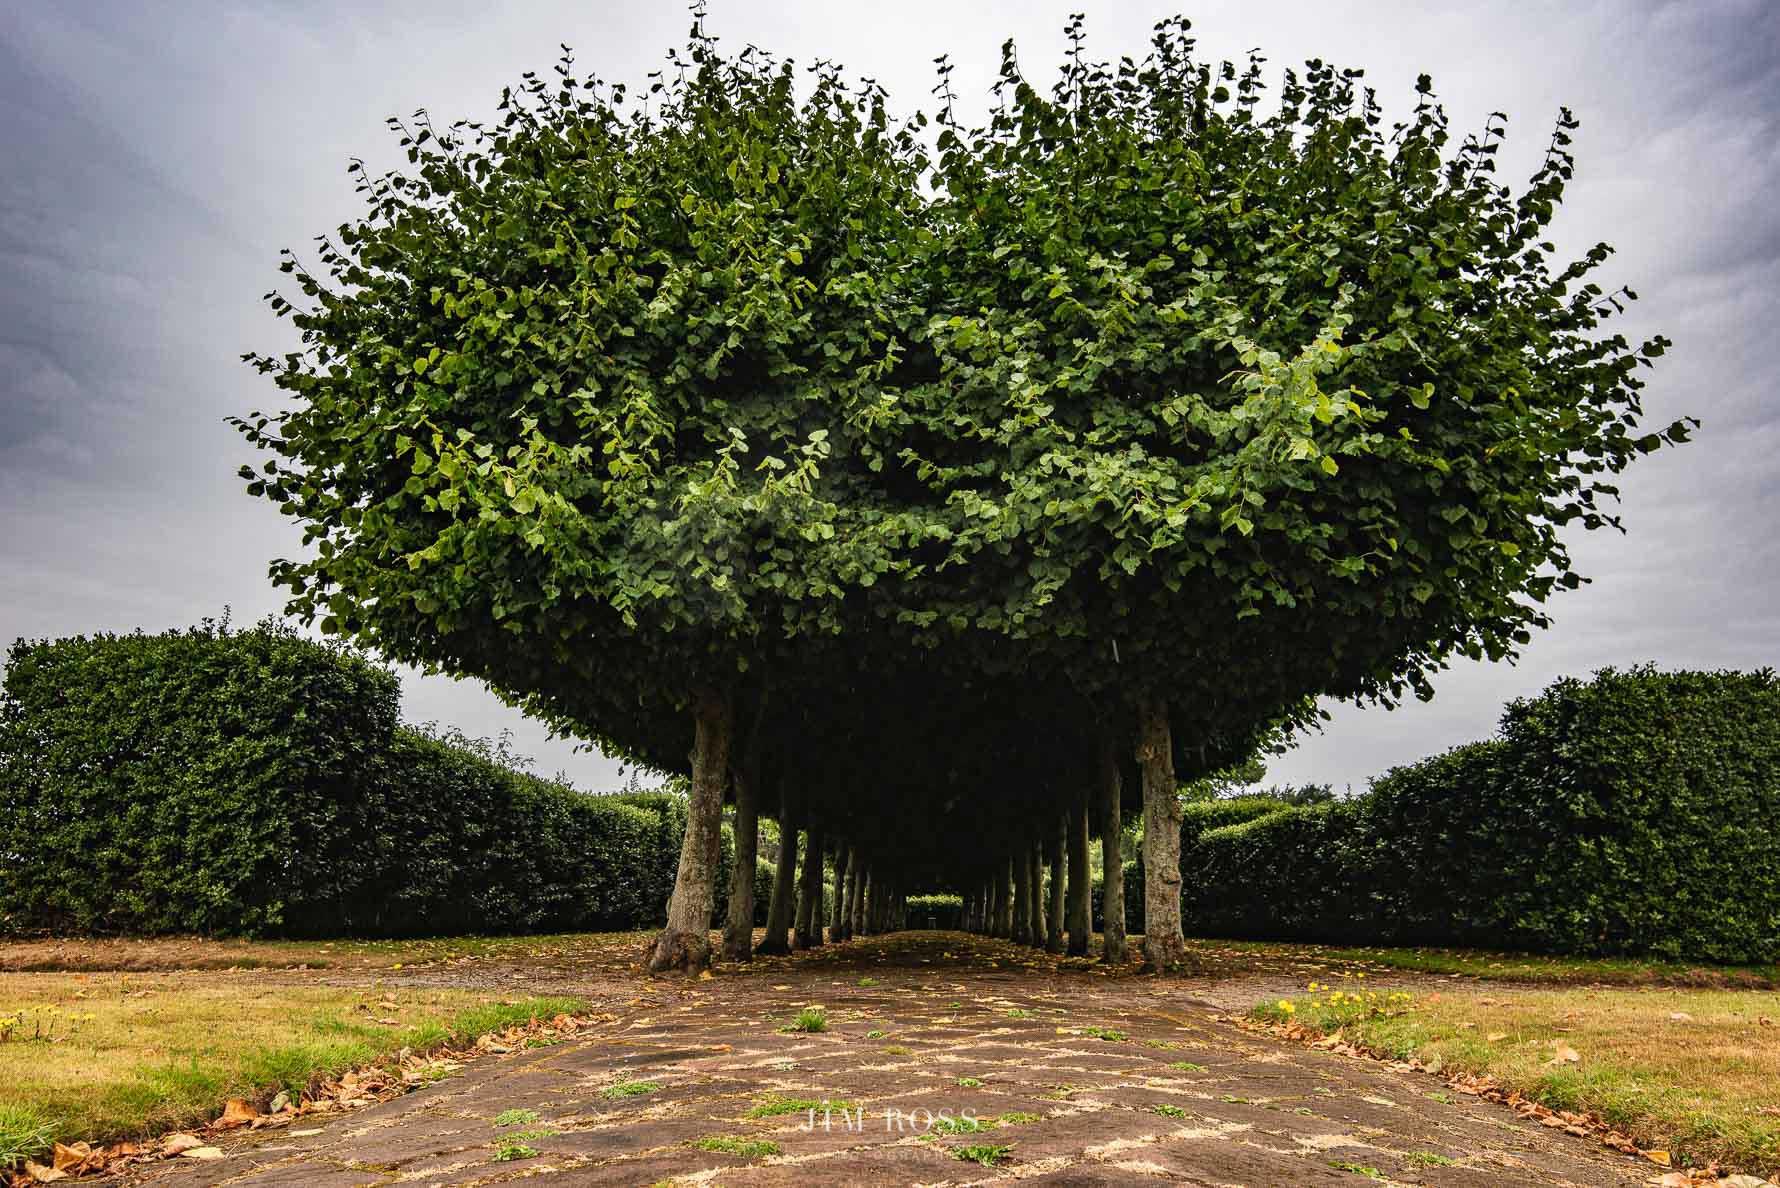 Heart-shaped tree avenue